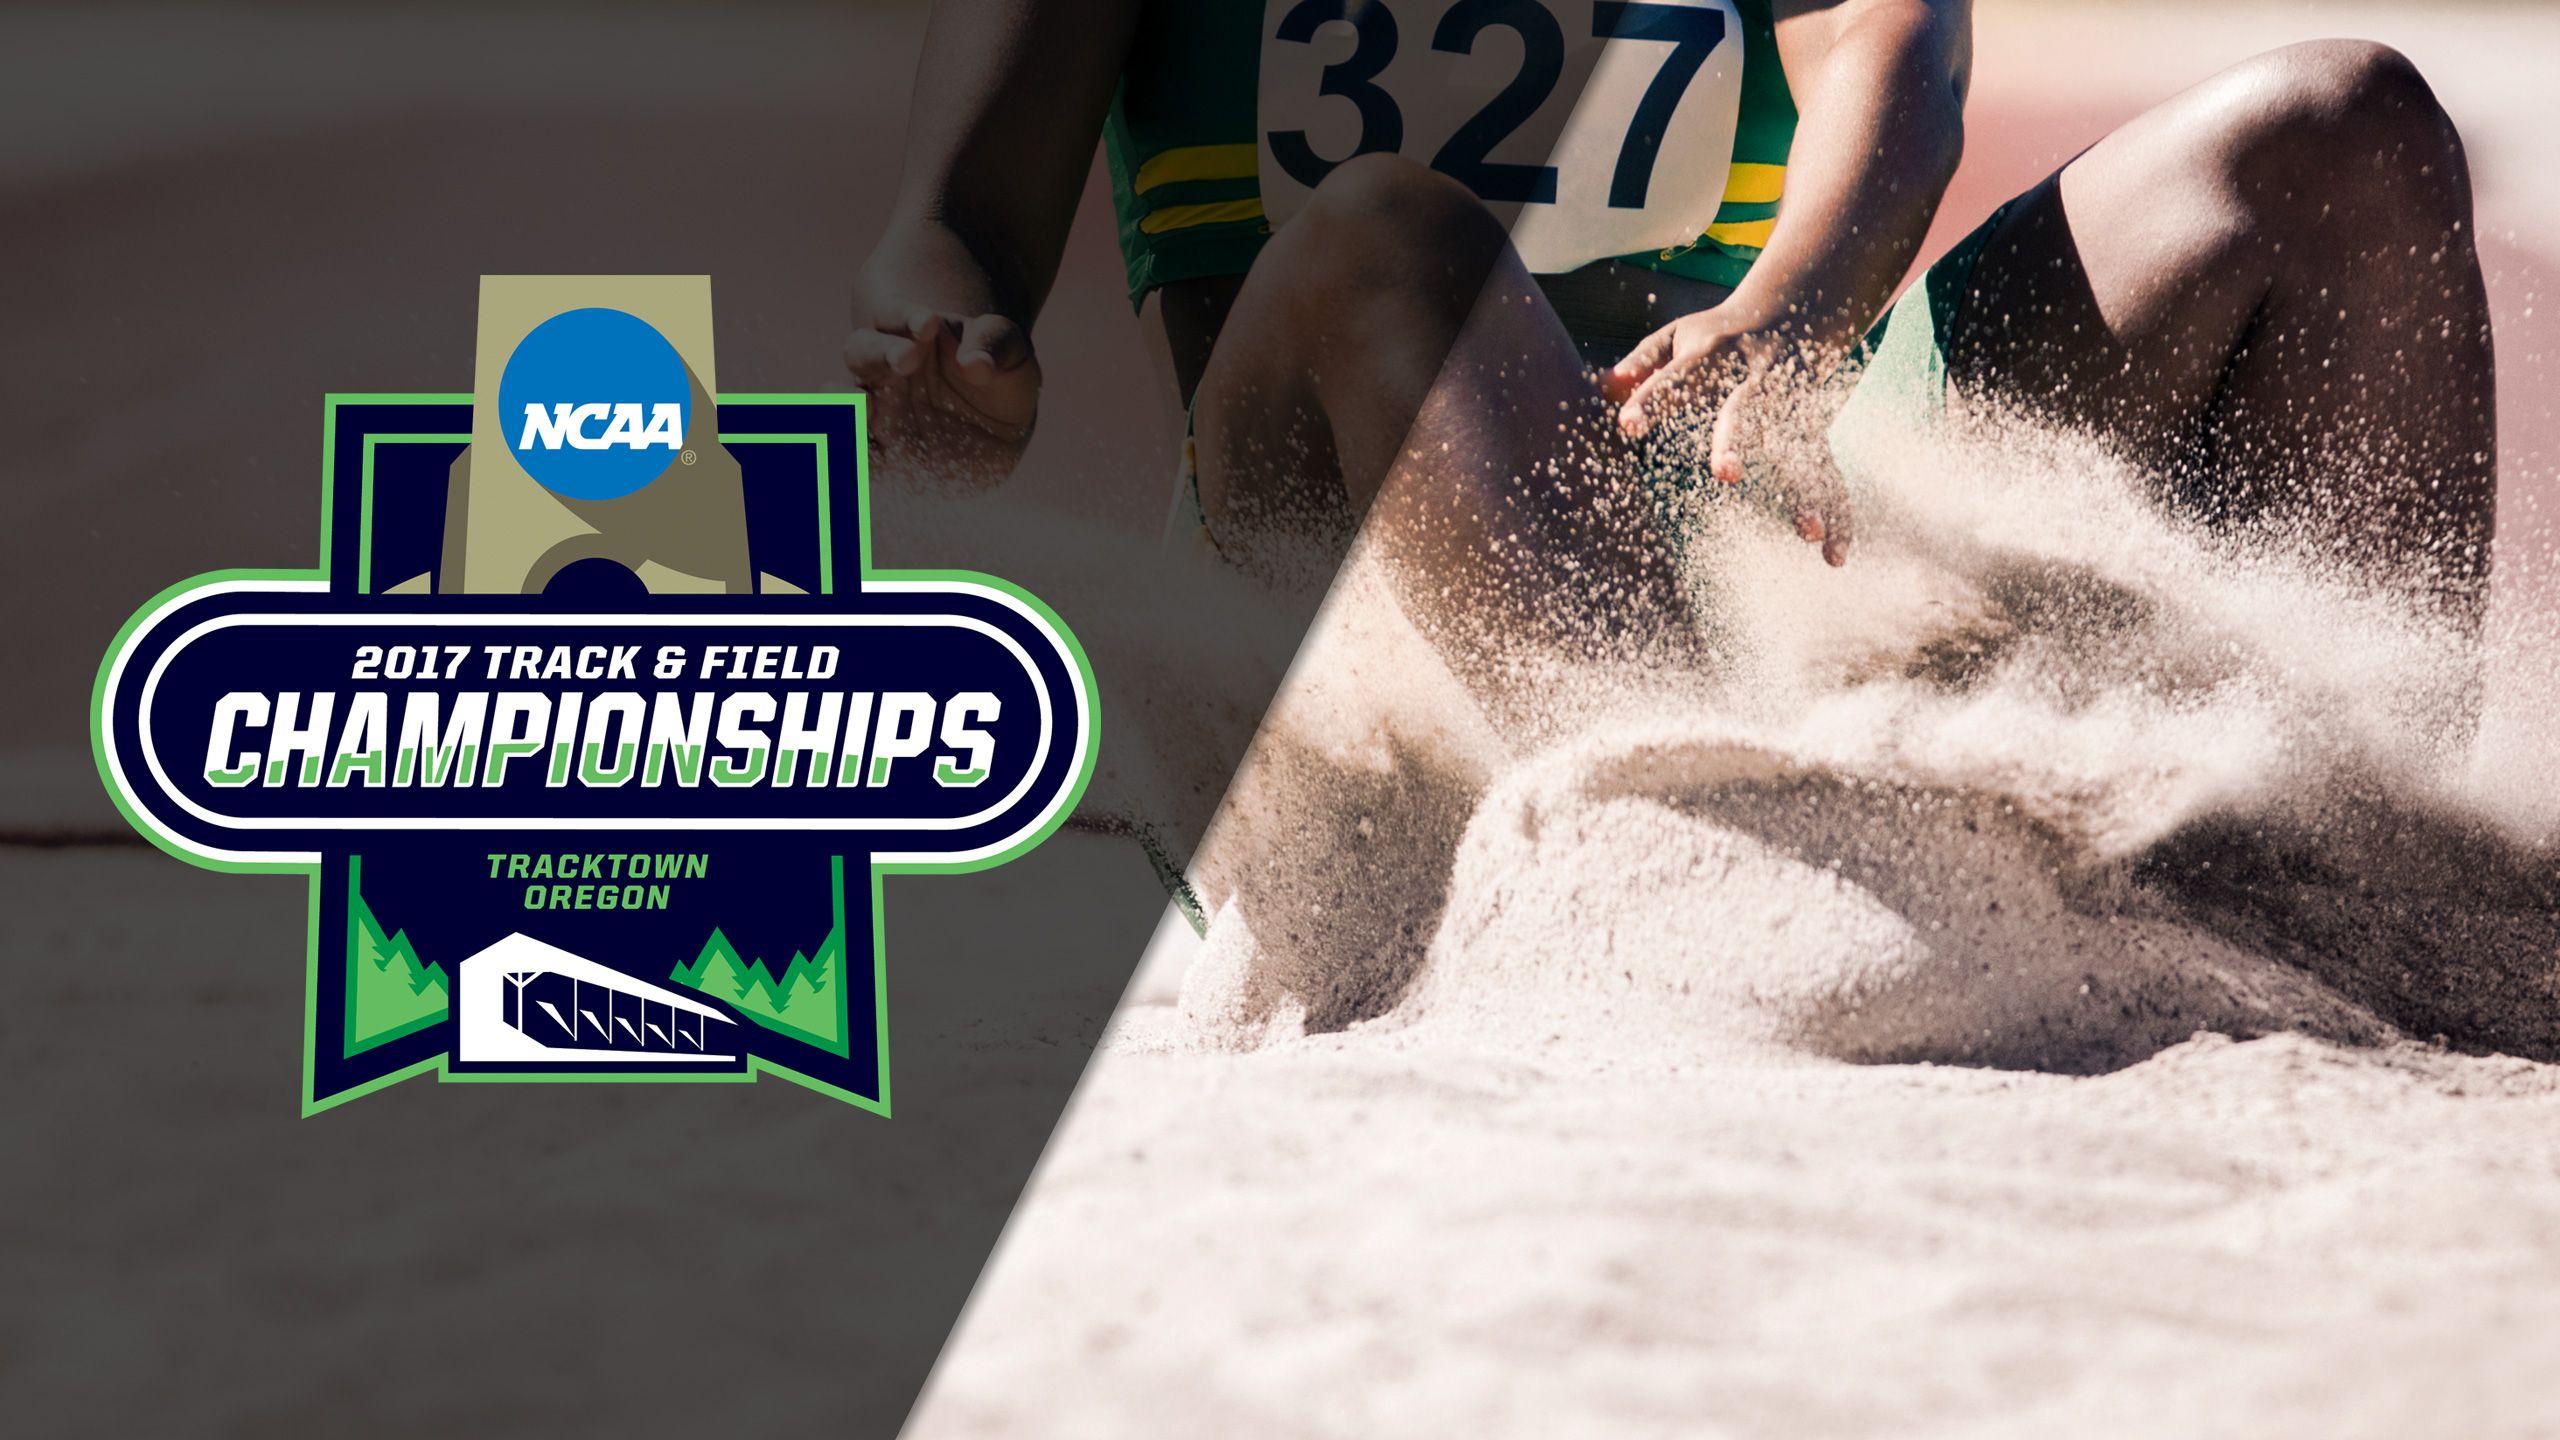 NCAA Track & Field Outdoor Championships - Women's Triple Jump Trials (Flight 2) & Final